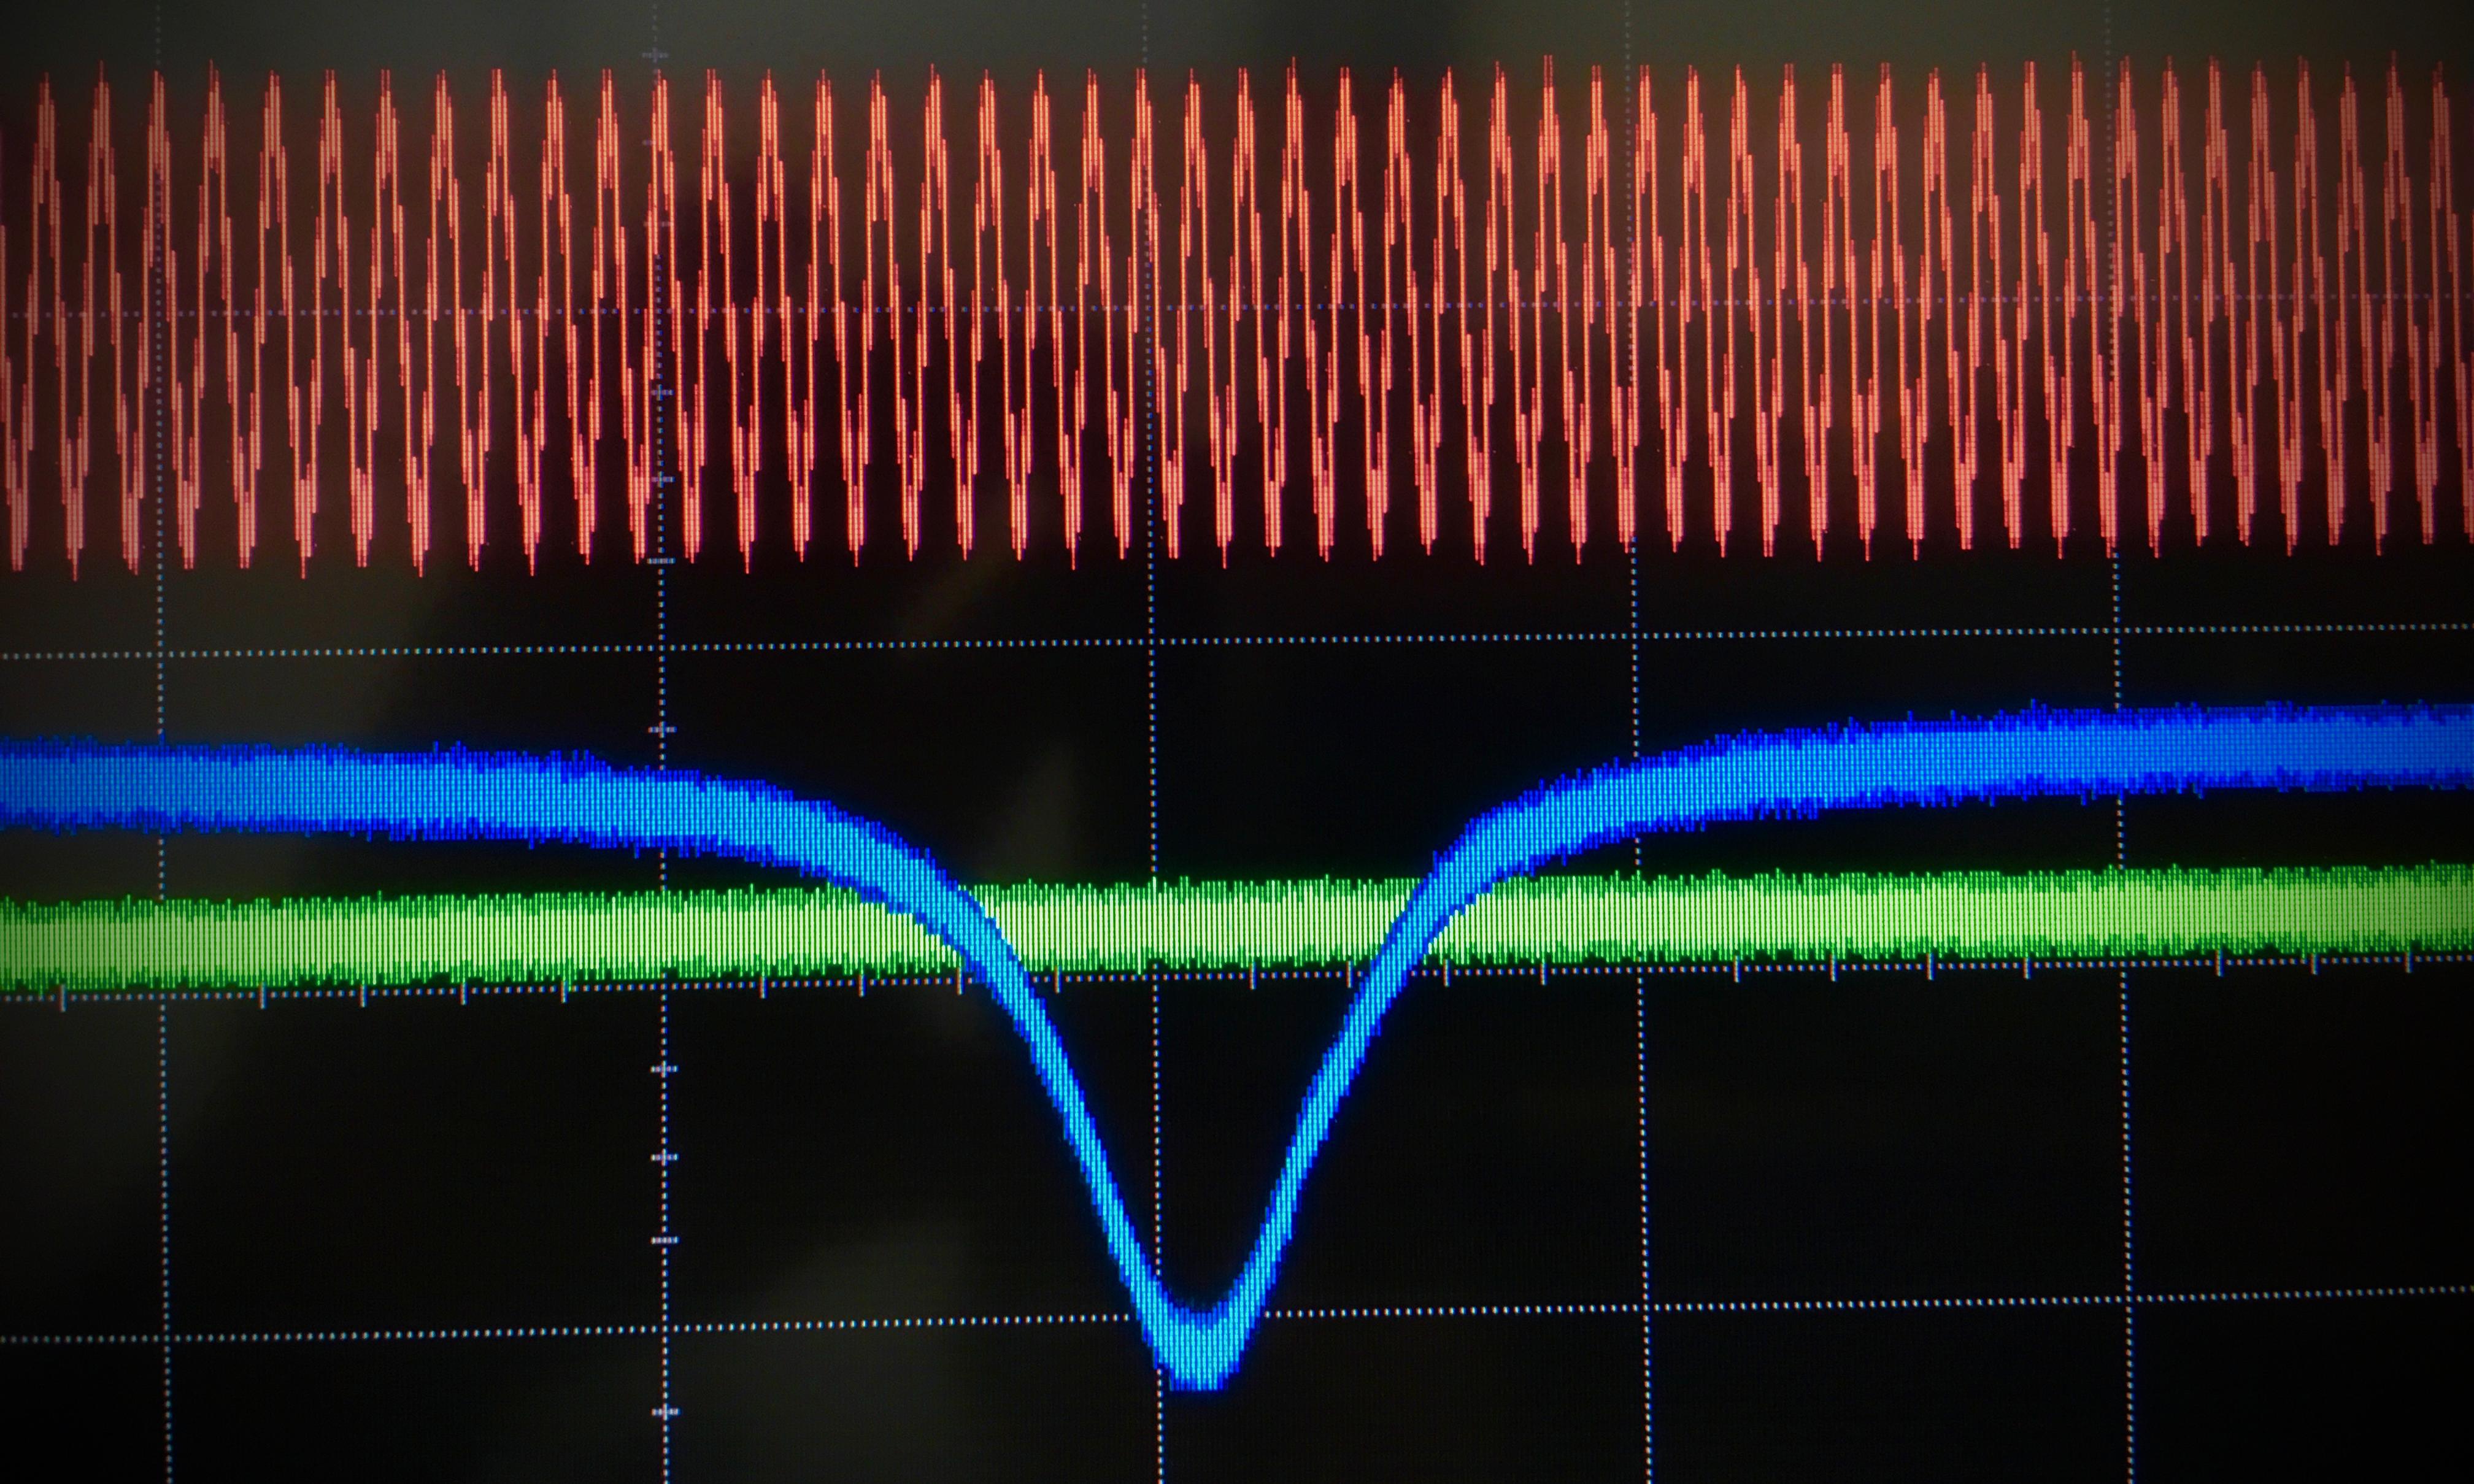 High-Q optical mode of microsphere resonator